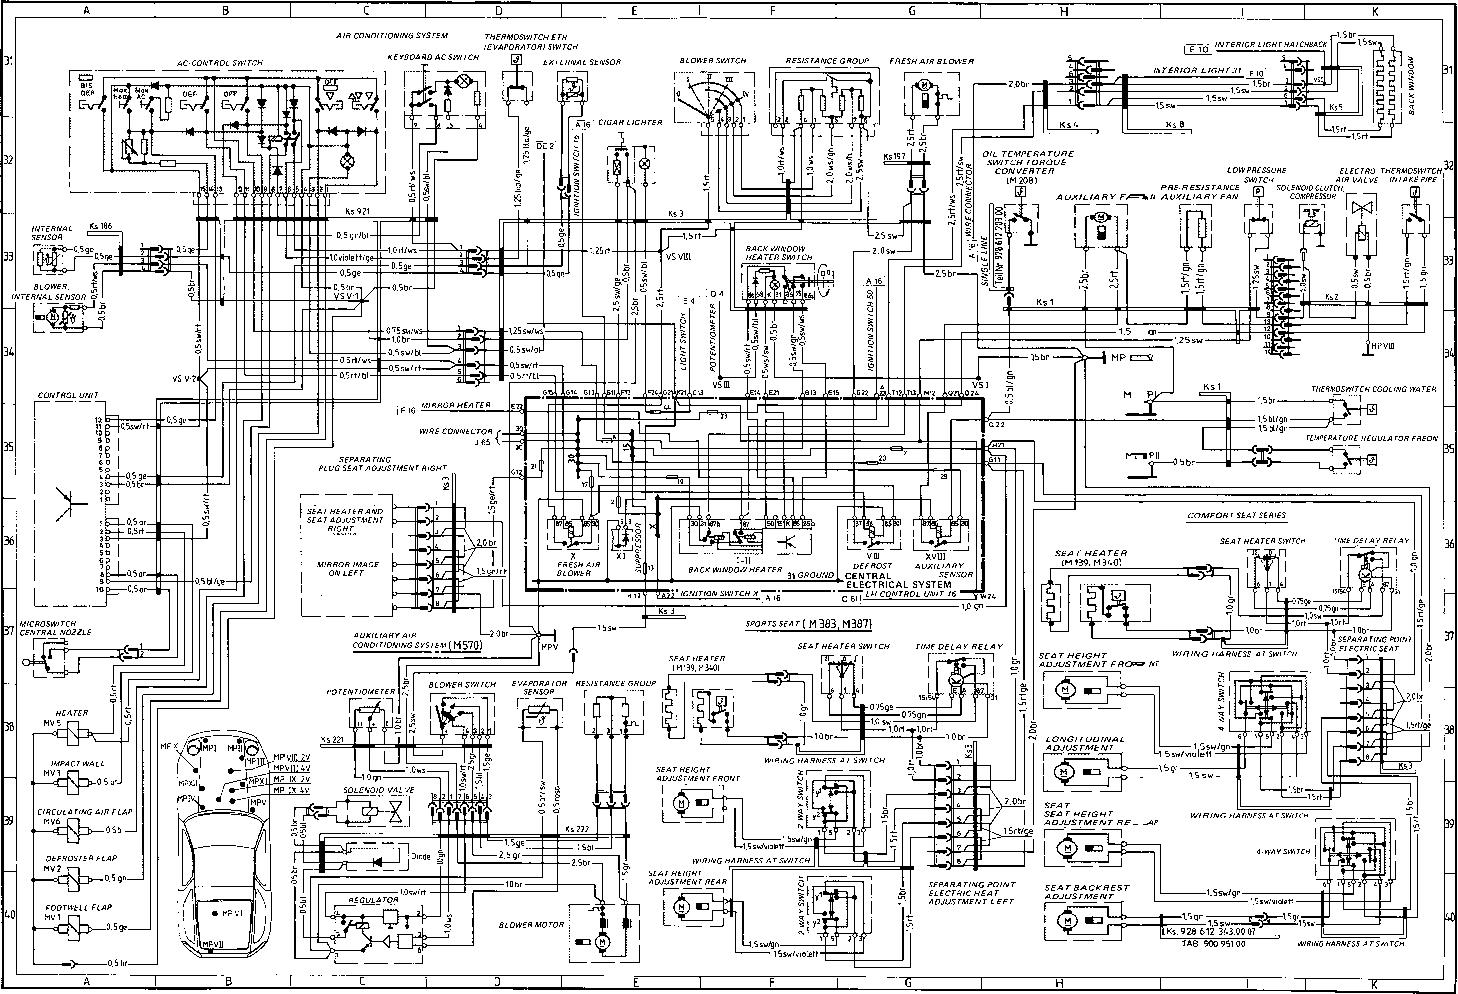 hight resolution of wiring window diagram switch 944 86 porsche schematic diagram1983 porsche 928s wiring diagram data wiring diagram